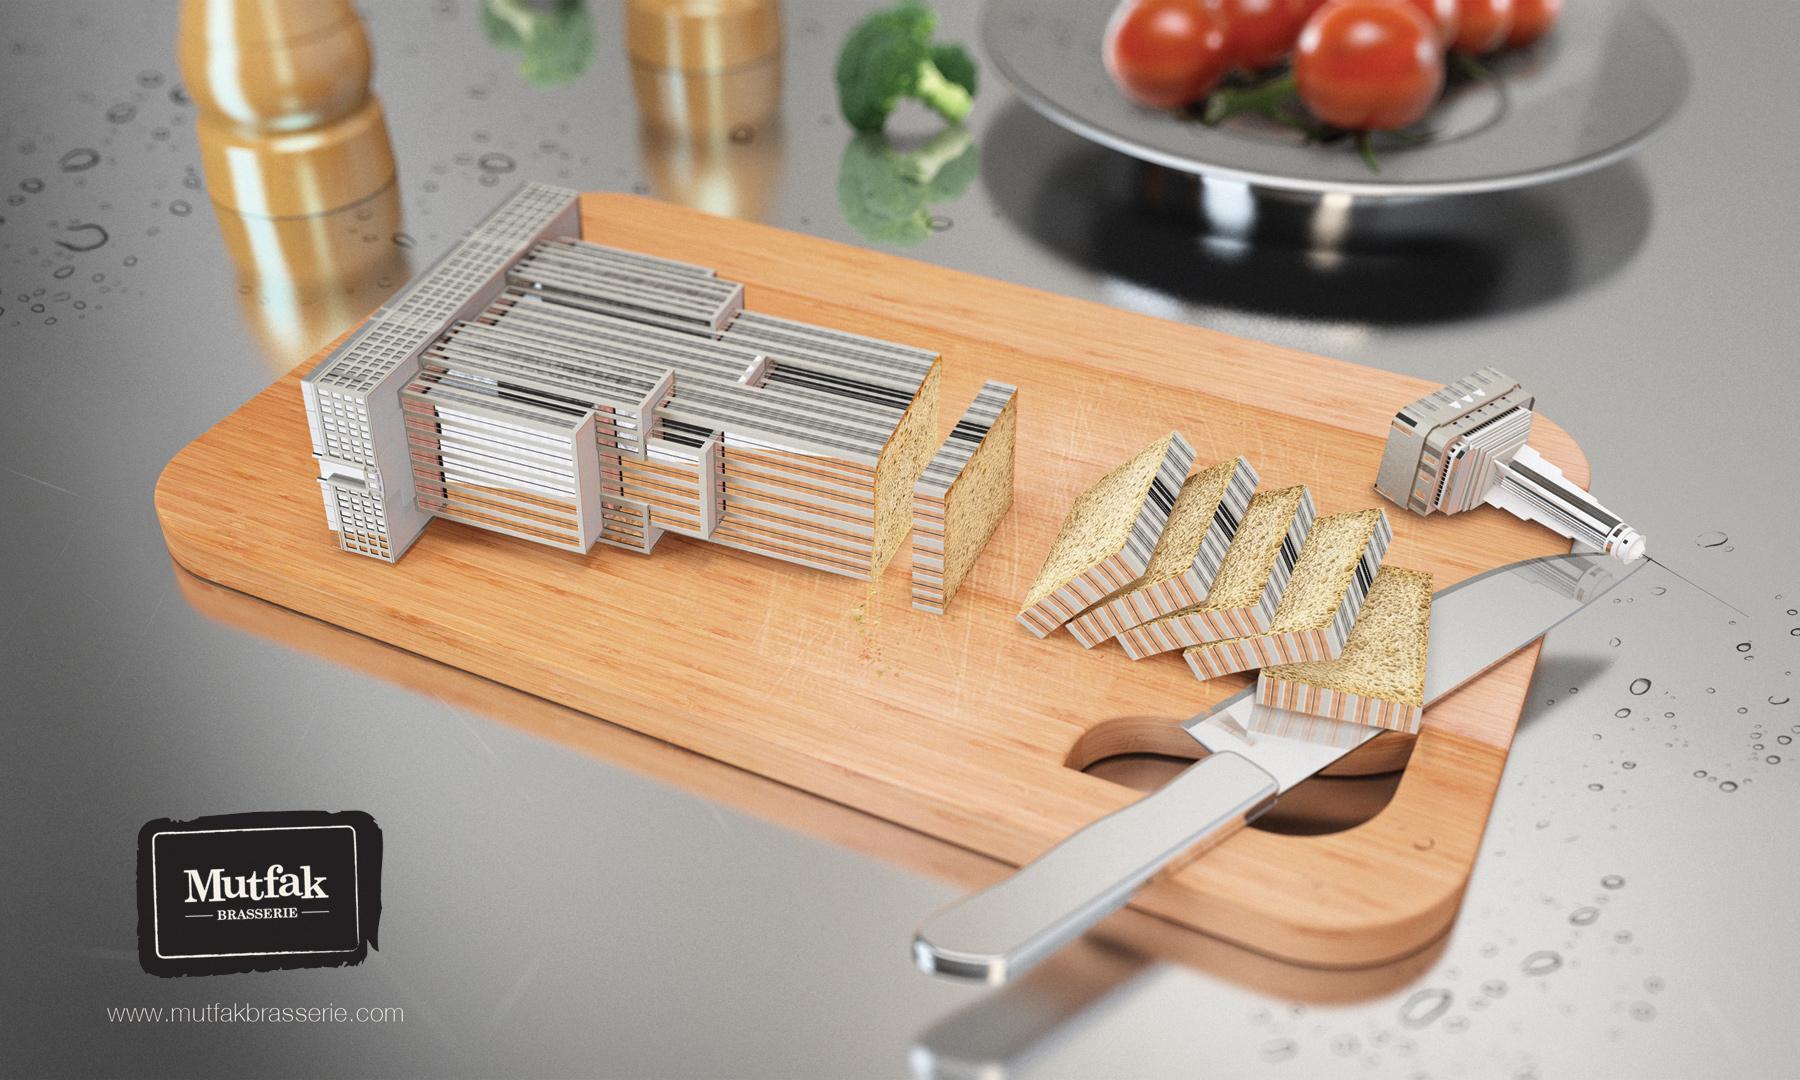 Mutfak Brasserie Print Ad -  World cuisine, New York